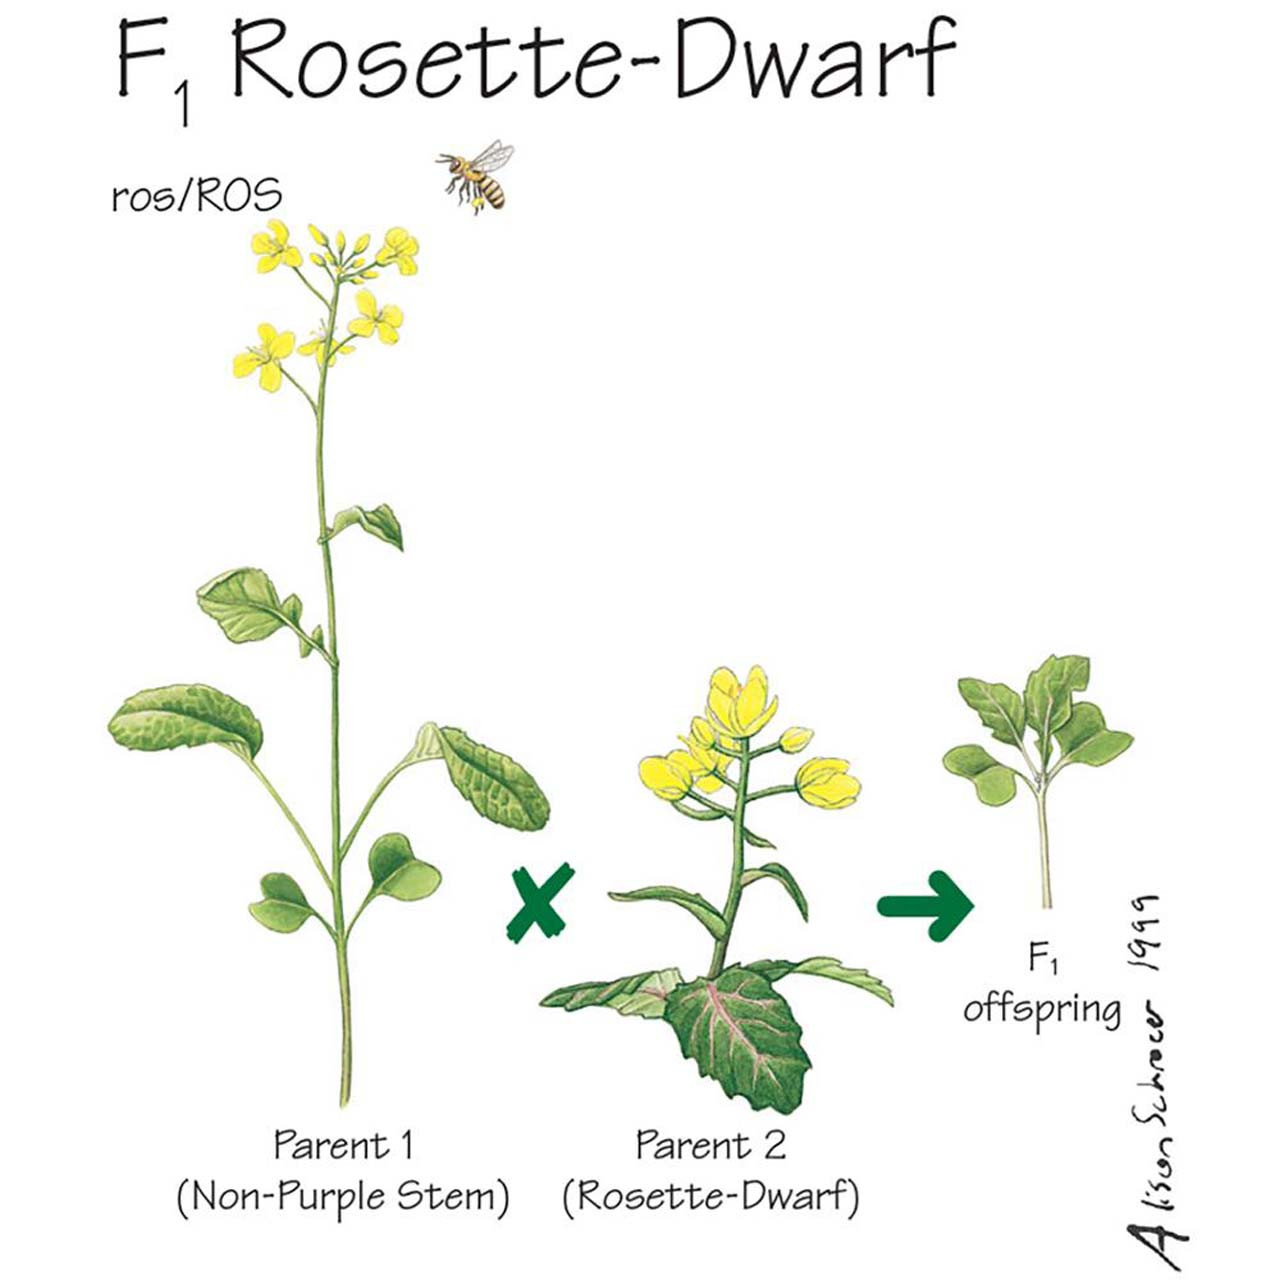 S13.16 - Brassica rapa seeds , F1, Rosette-dwarf, non-purple stem